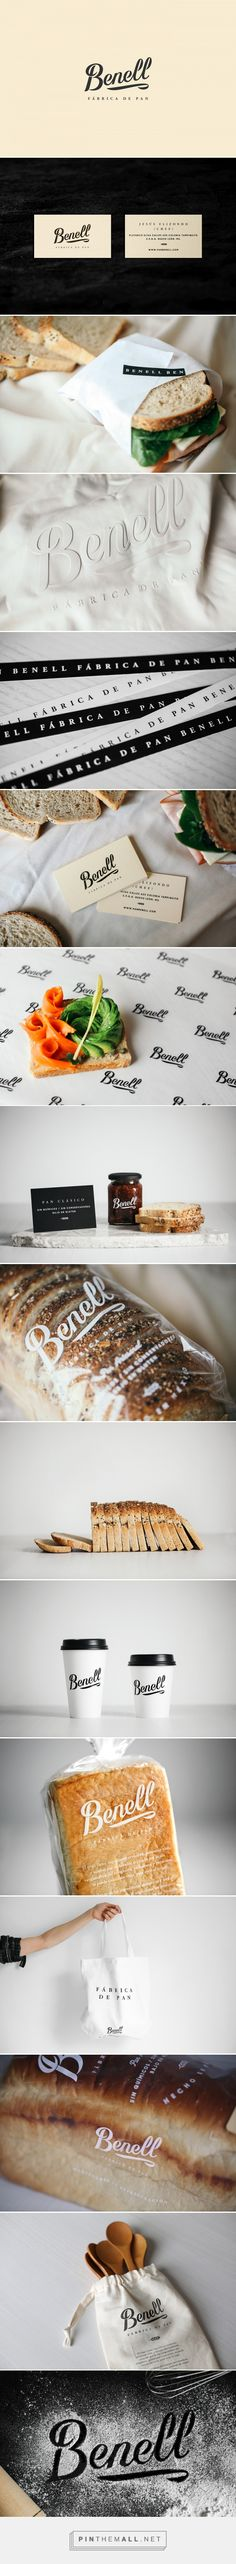 Benell Branding